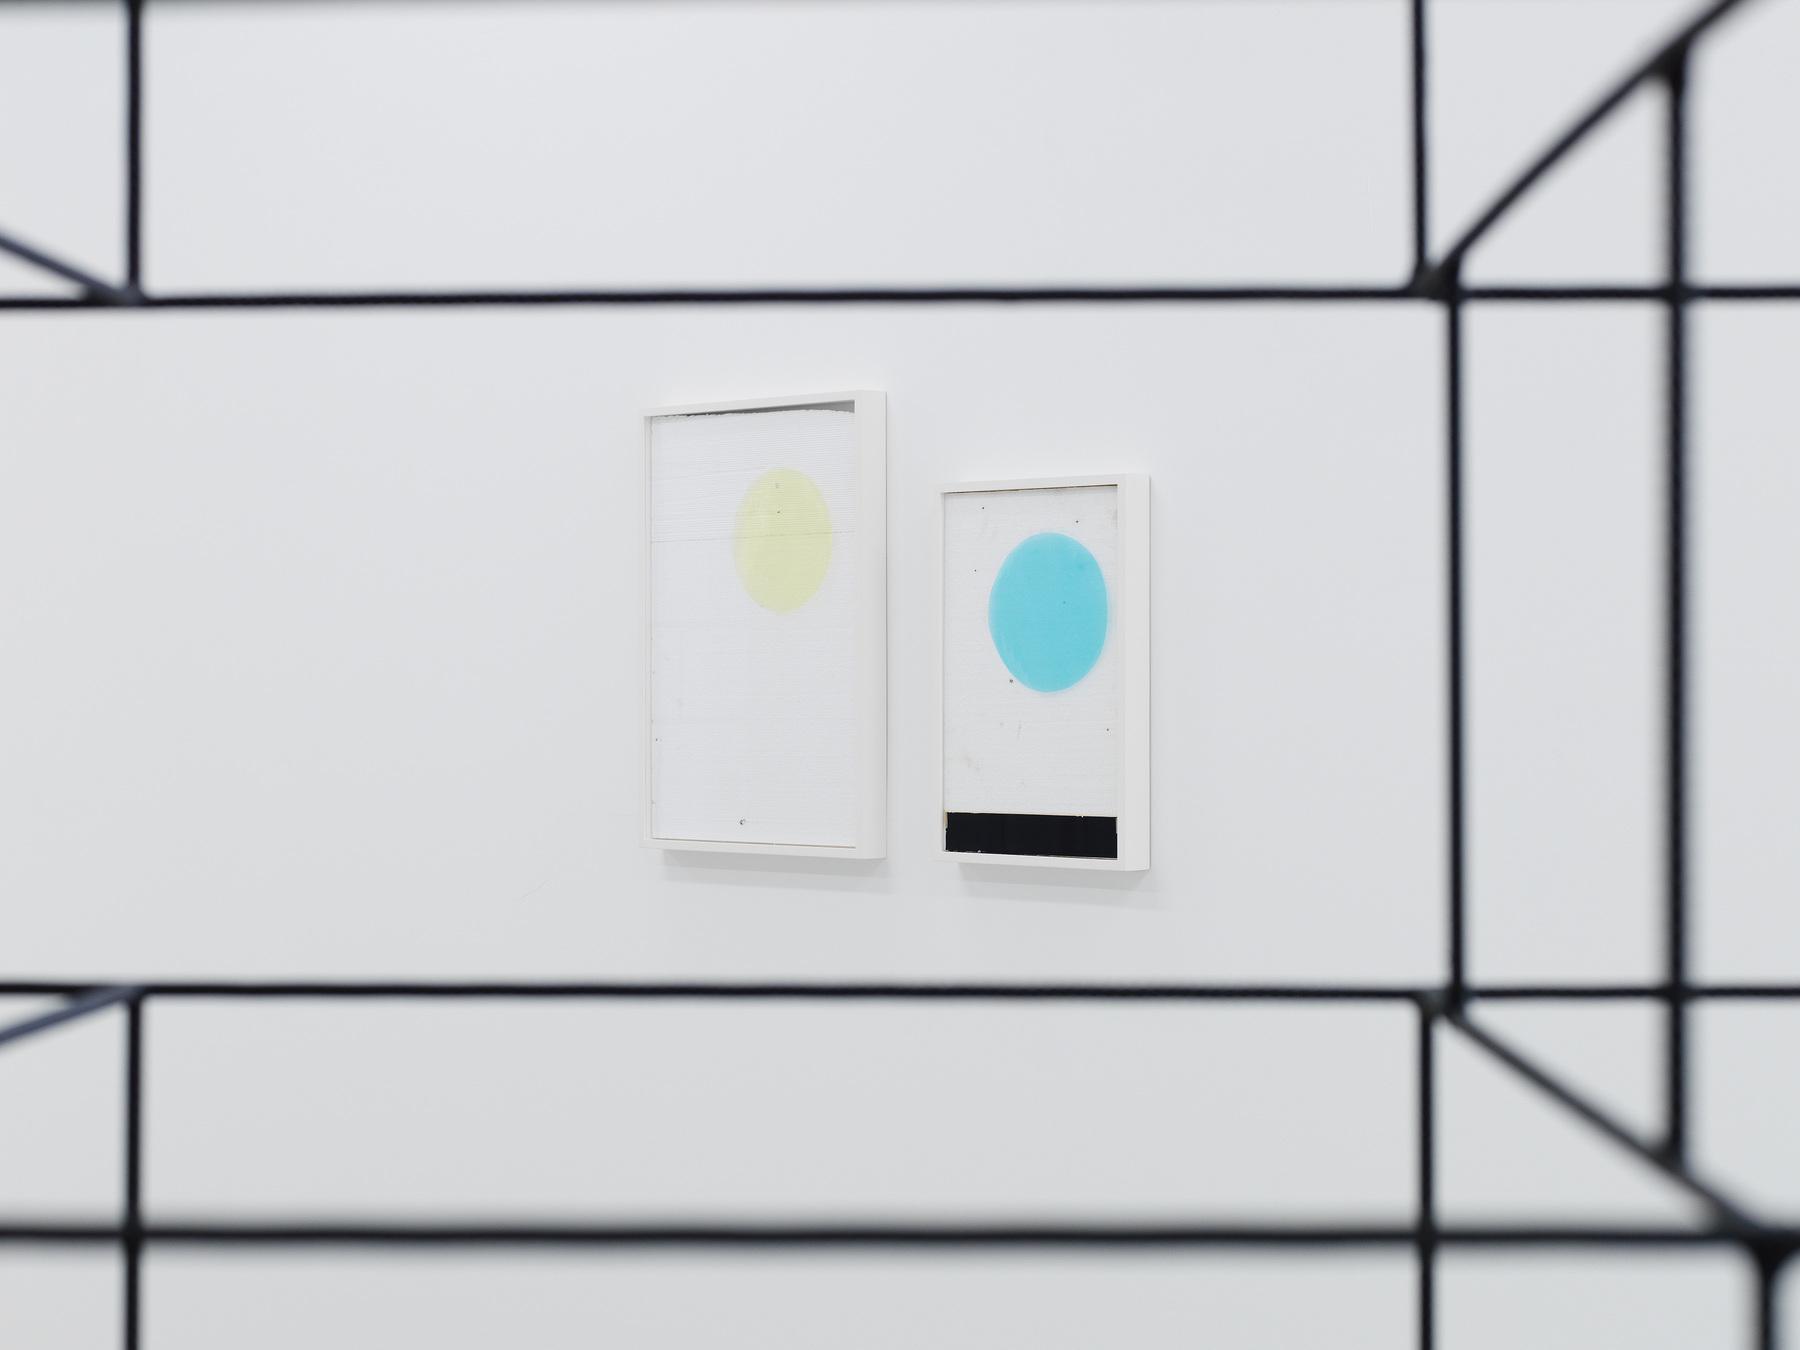 11_Edit Oderbolz_Kunstverein Nürnberg_2017